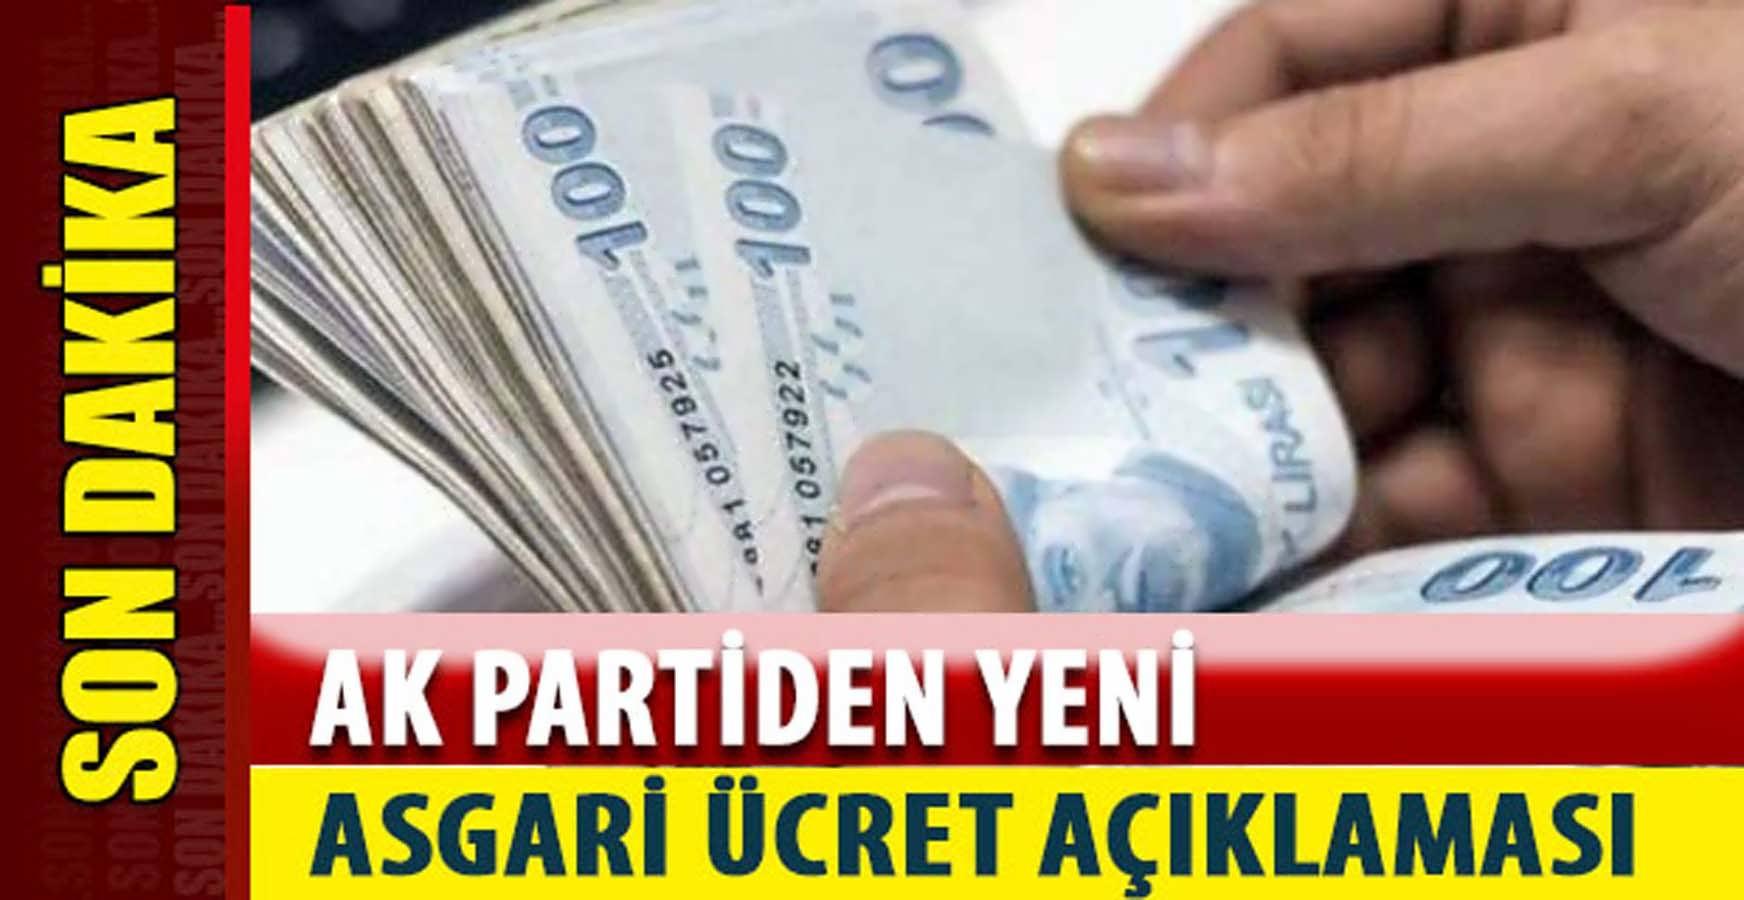 Ak Parti Yeni Asgari Ücret Açıklaması